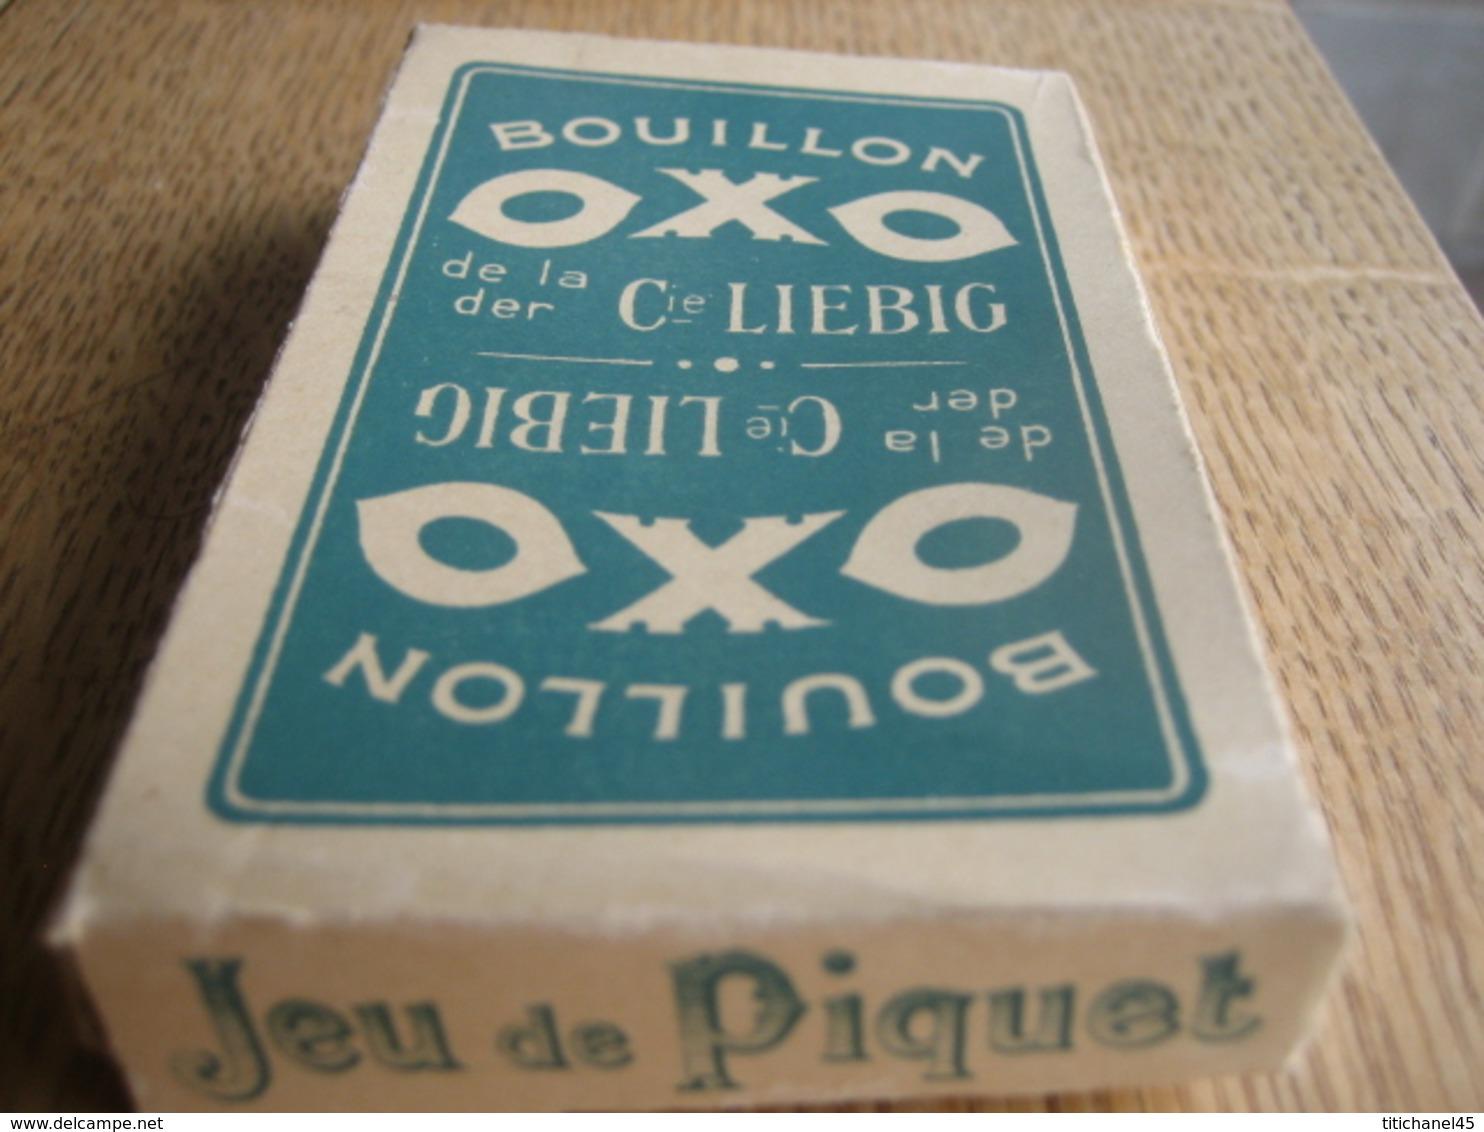 Jeu De Cartes Ancien PIQUET De 36 Cartes (+ Un Joker) PUB Bouillon OXO De La Cie LIEBIG - Playing Cards (classic)